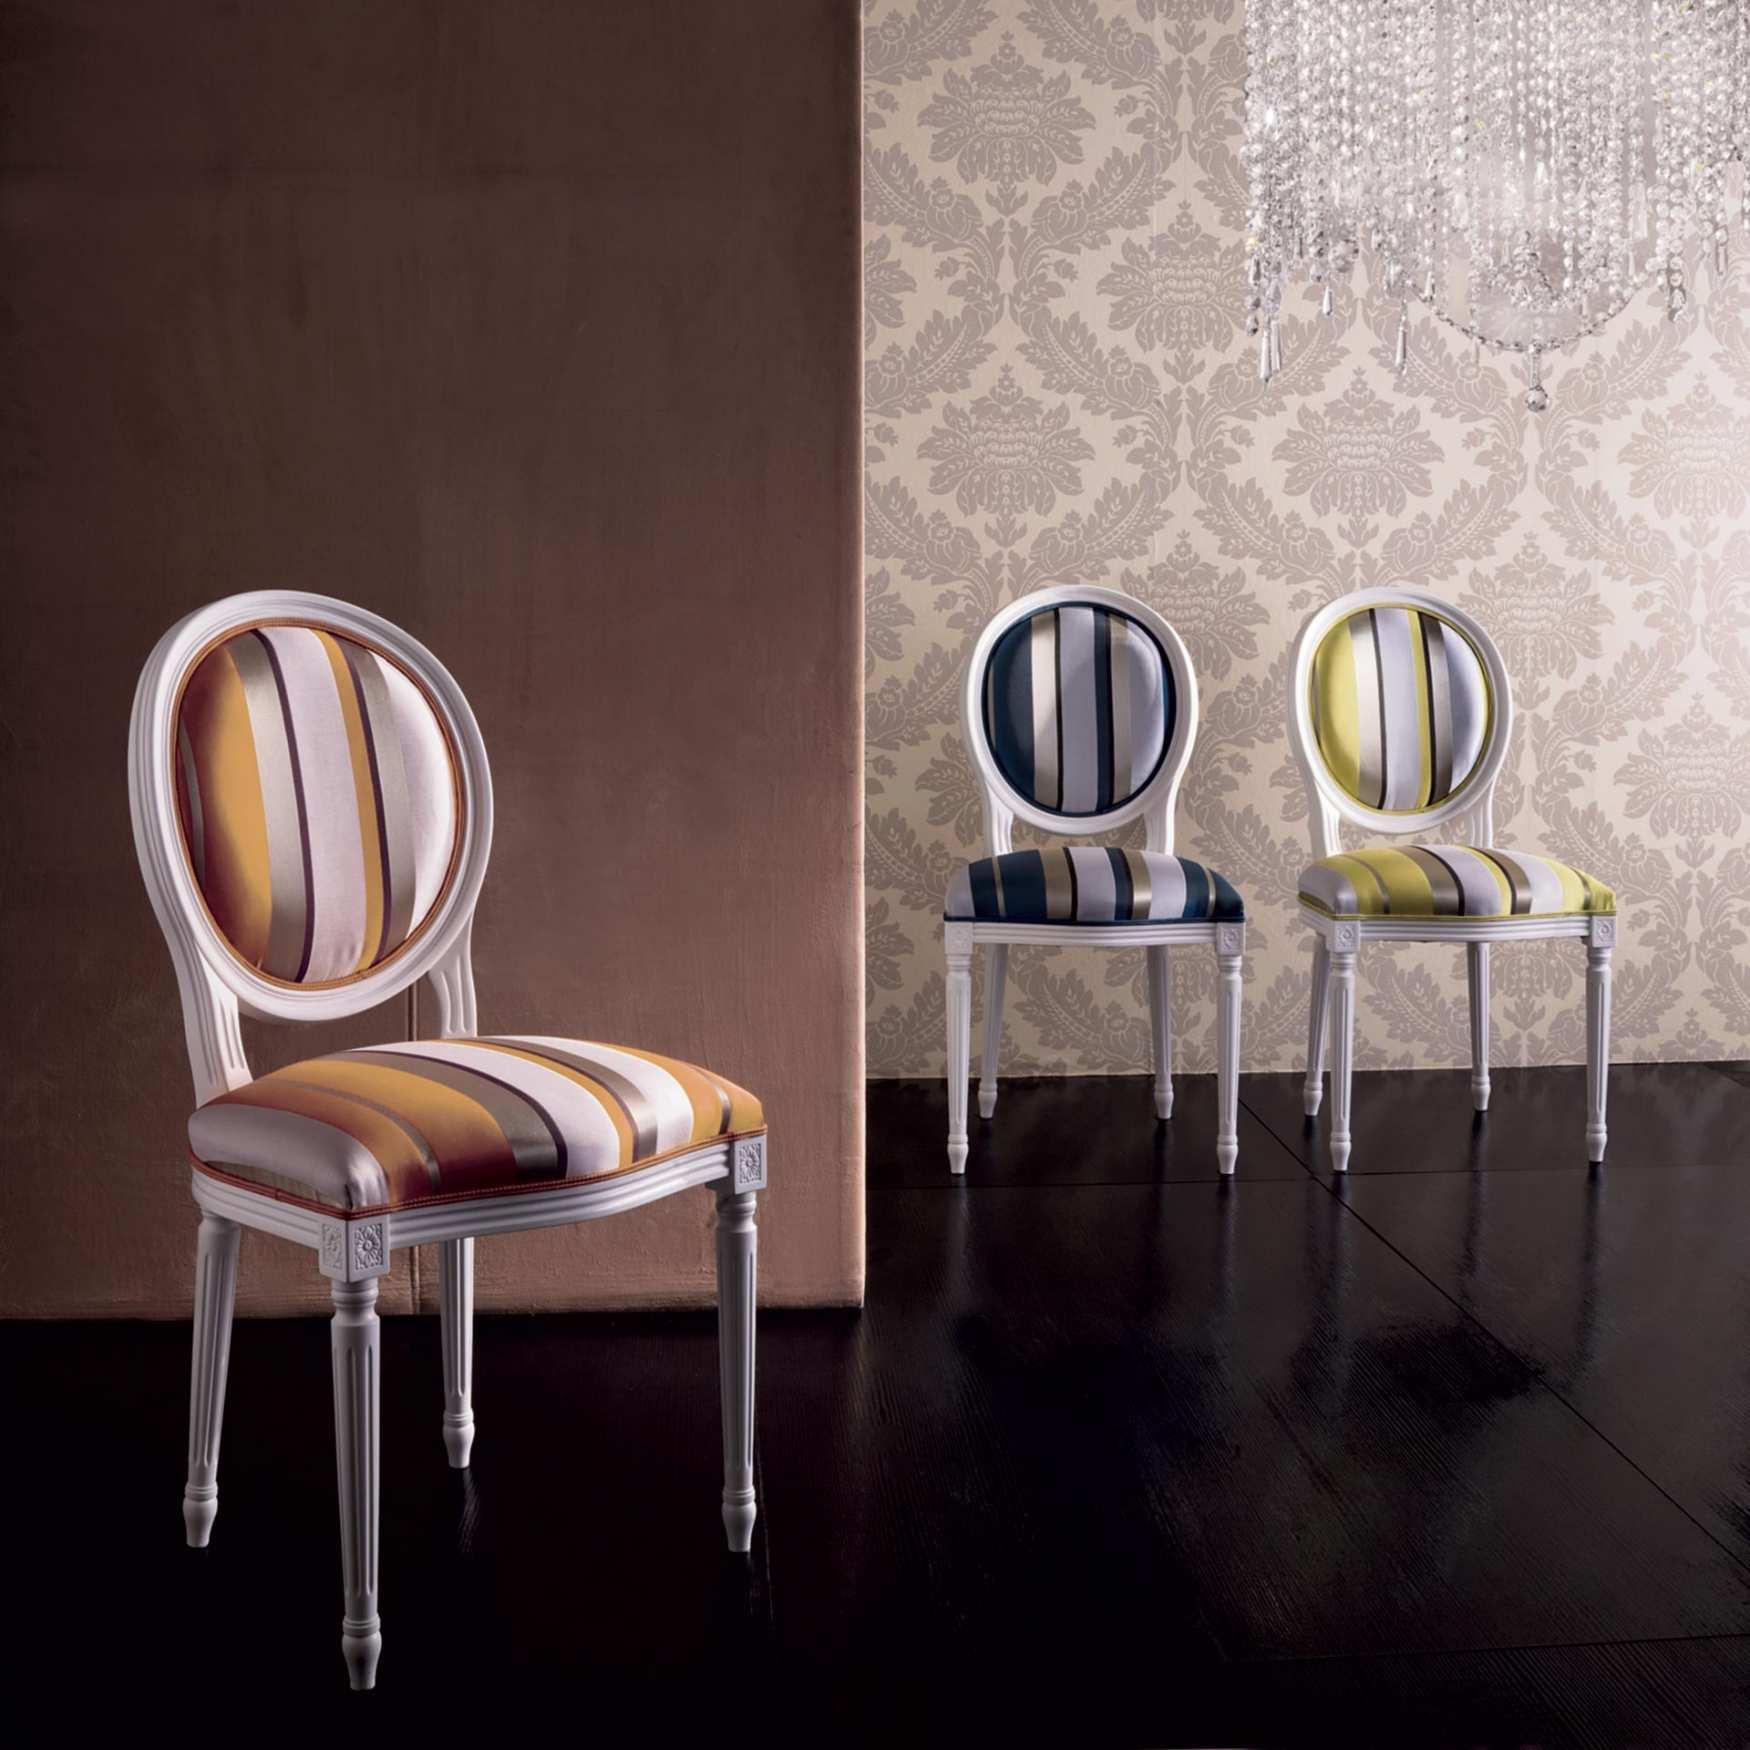 Sedia luigi xvi Luigina | milanomondo